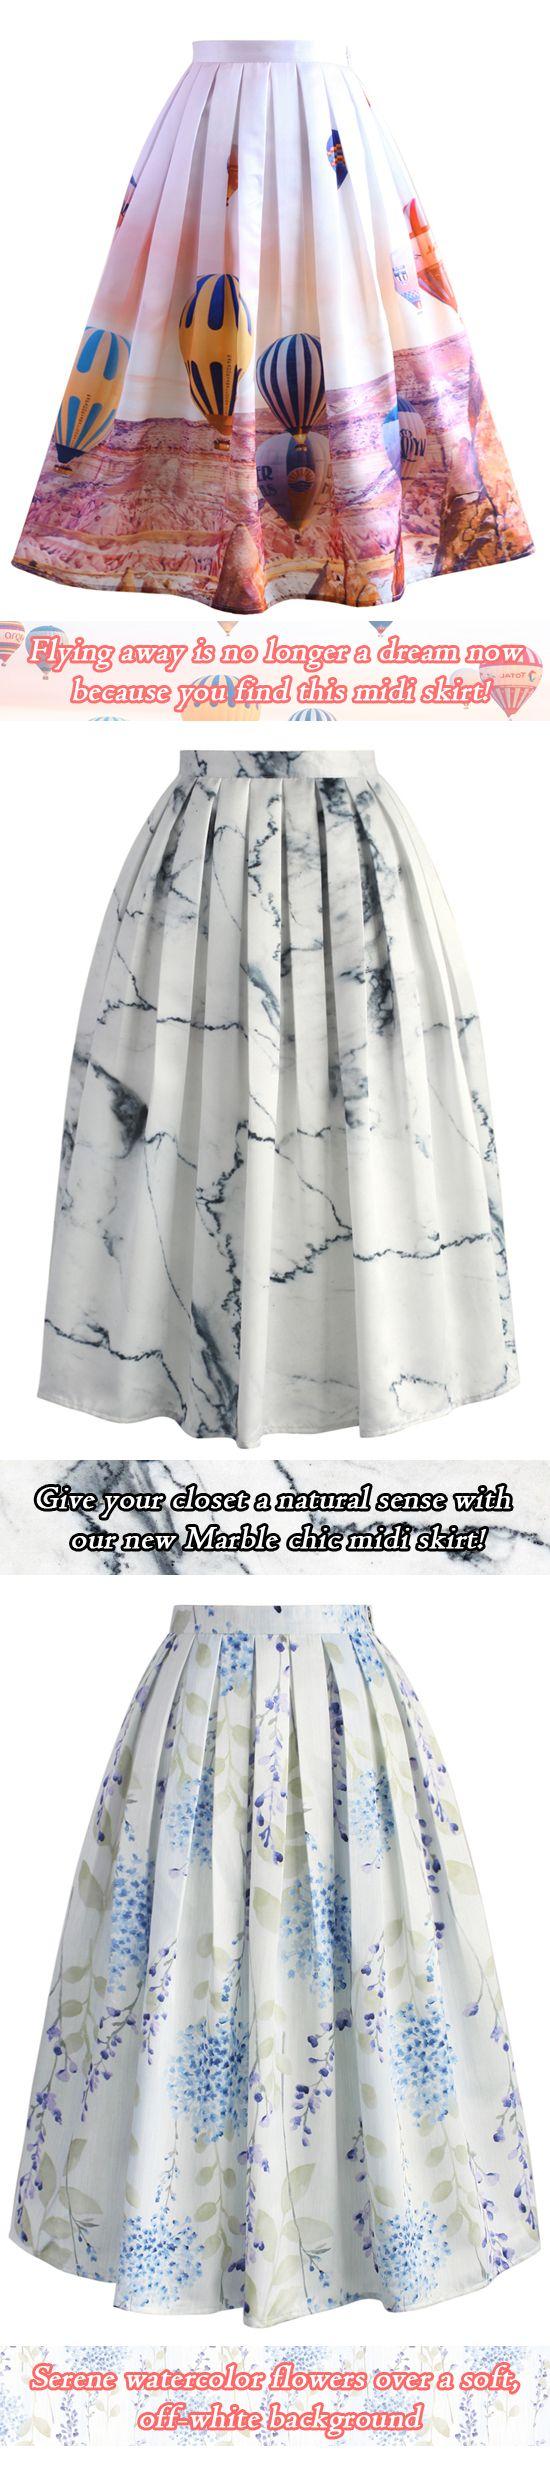 PRINT MIDI SKIRT, marble skirt, balloon skirt, floral skirt  chicwish.com